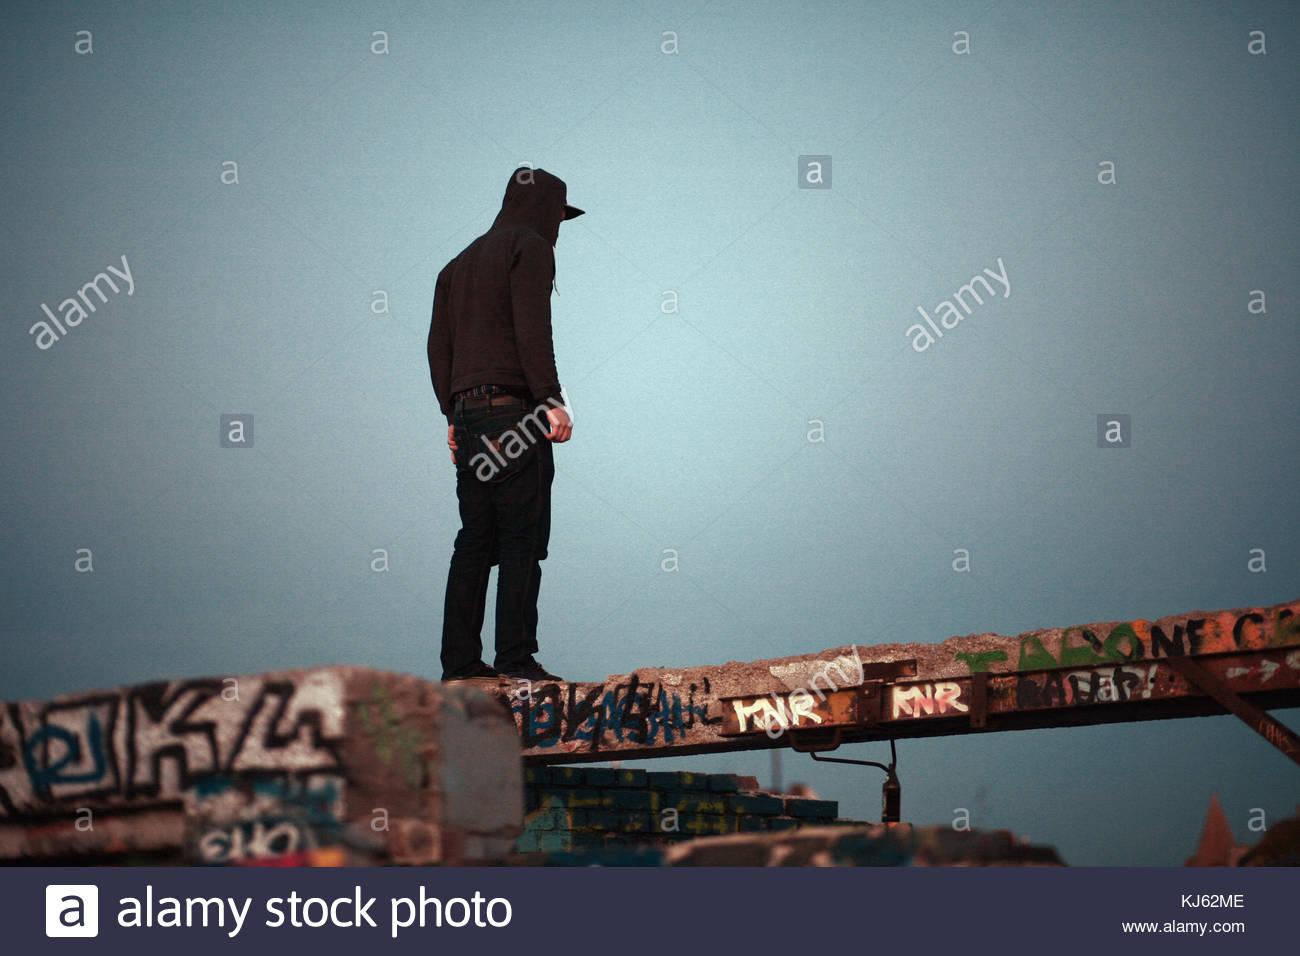 Junger Erwachsener Mann auf Graffiti entfernt Stockbild